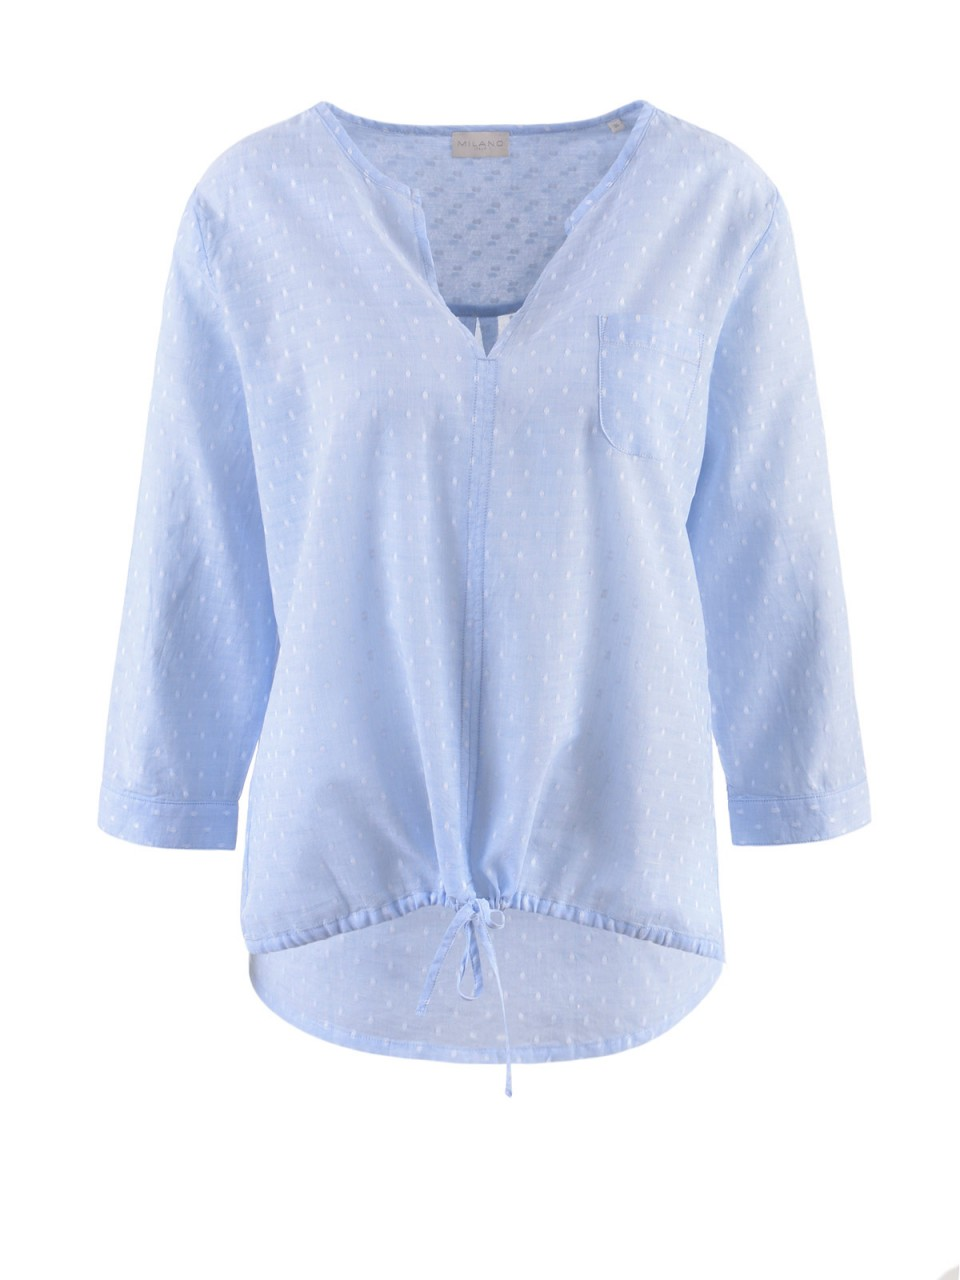 milano-italy-damen-bluse-blau-wei-szlig-